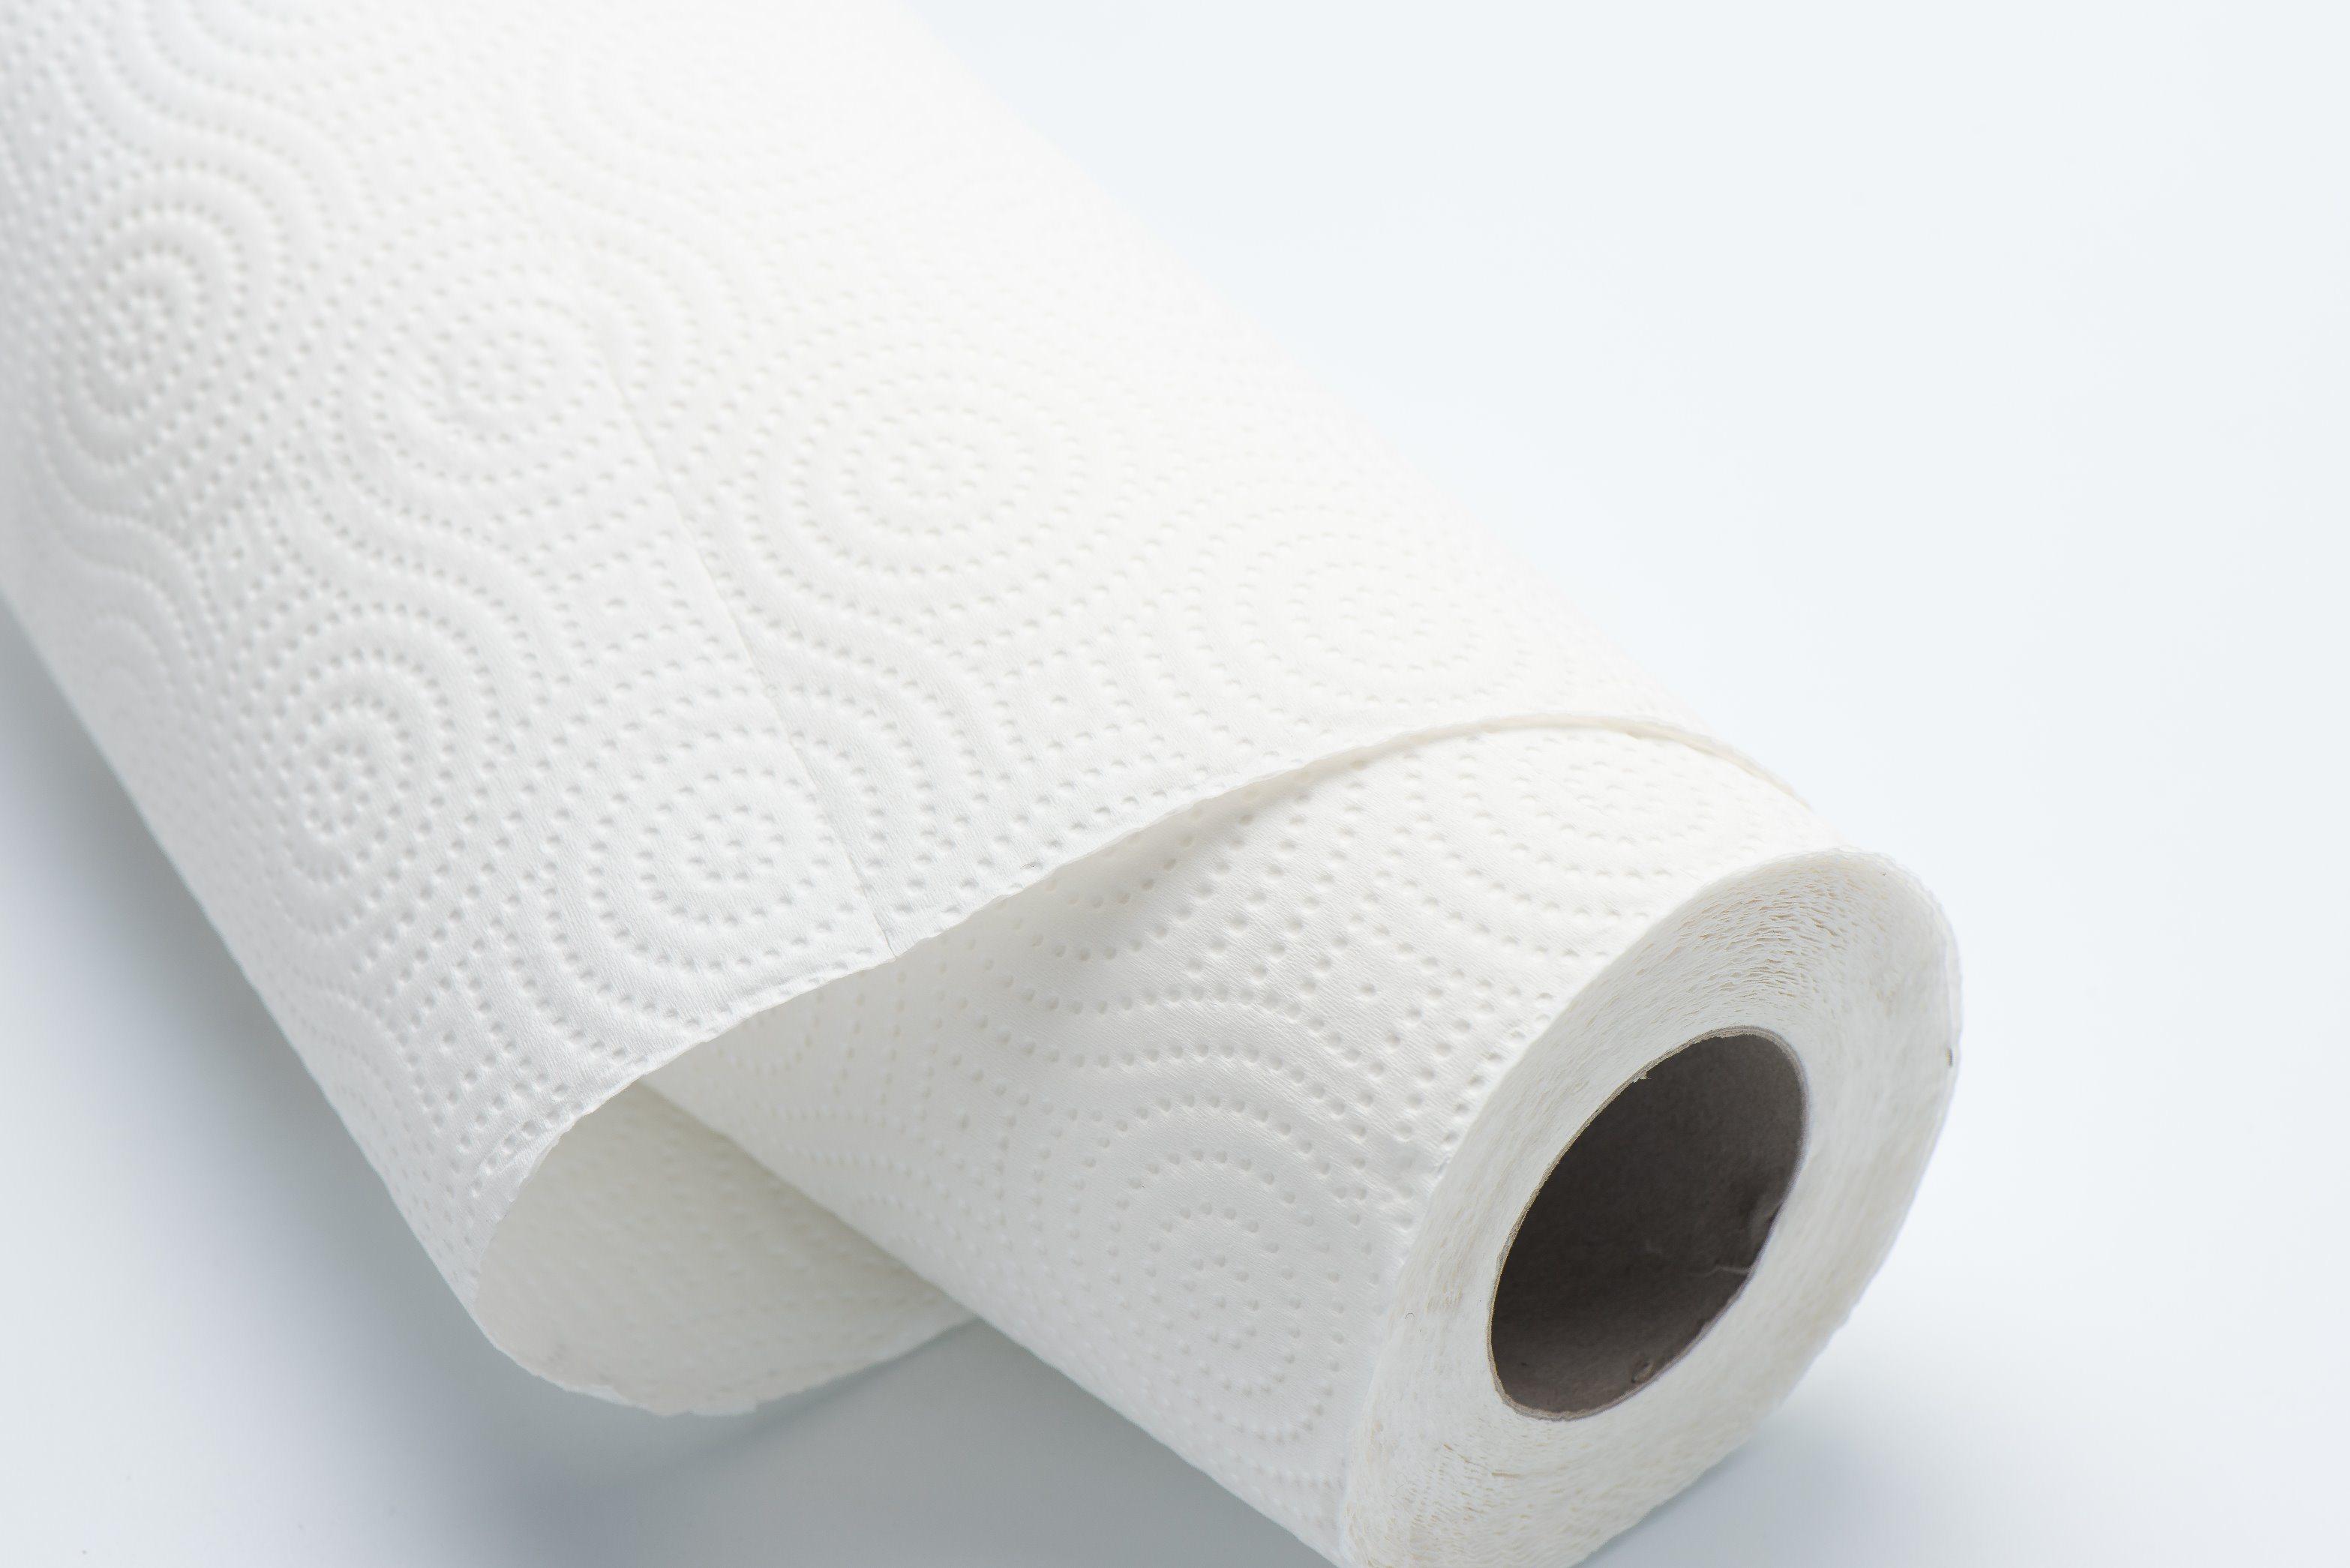 Properties Of Tissue Paper - Absorbency